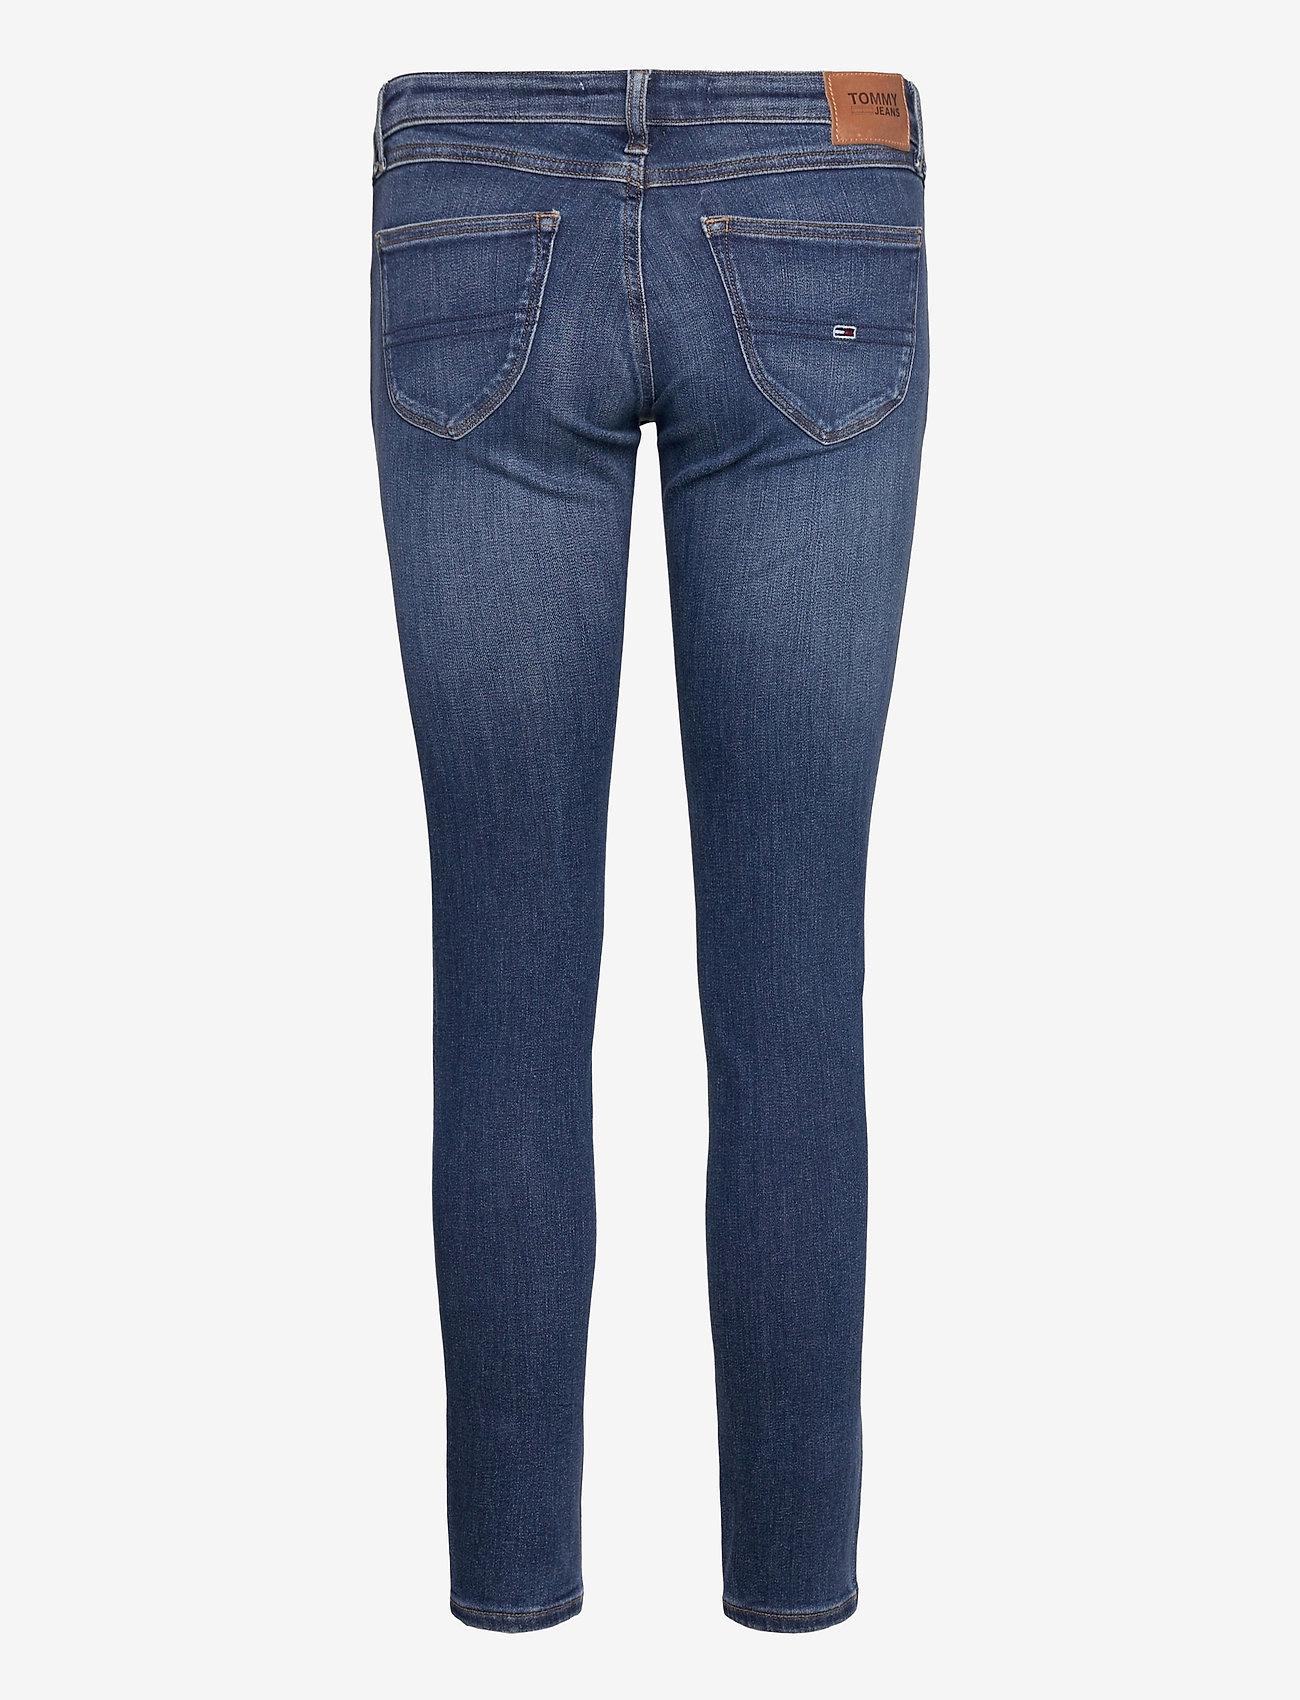 Tommy Jeans - SOPHIE LR SKNY HLDBST - skinny jeans - harlow dark blue str - 1